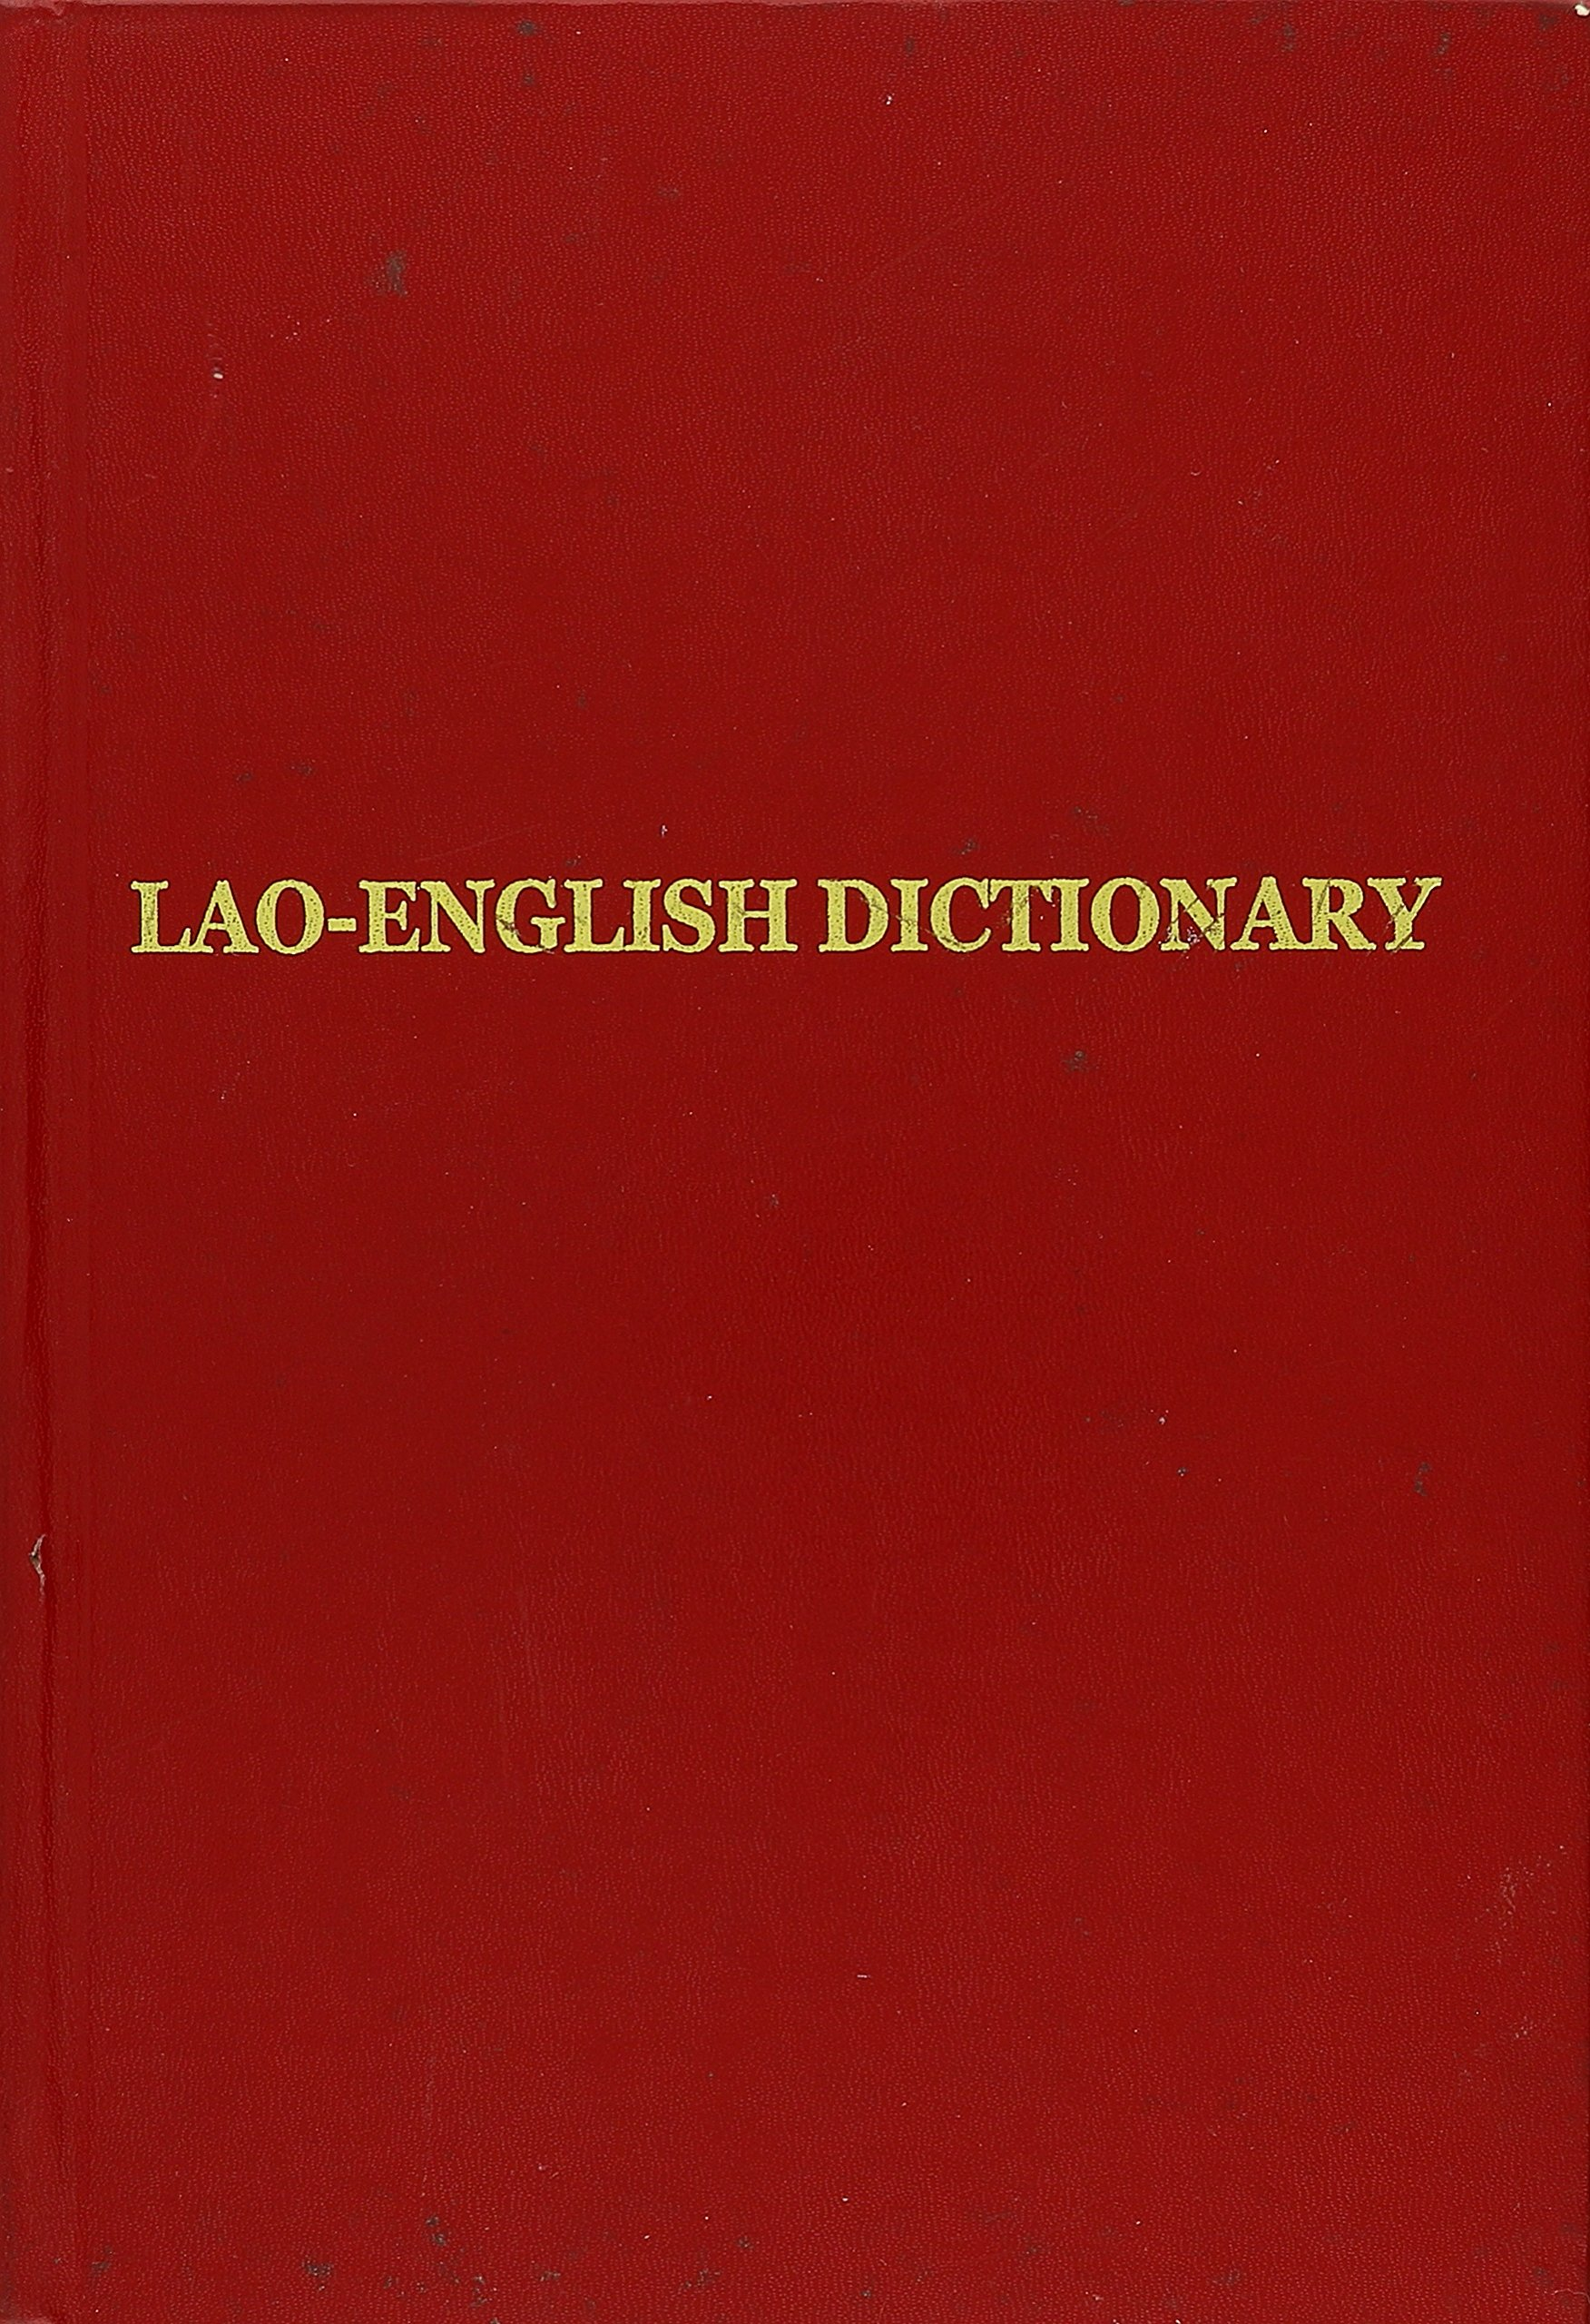 Lao-English Dictionary: Allen Kerr: 9789748495699: Amazon